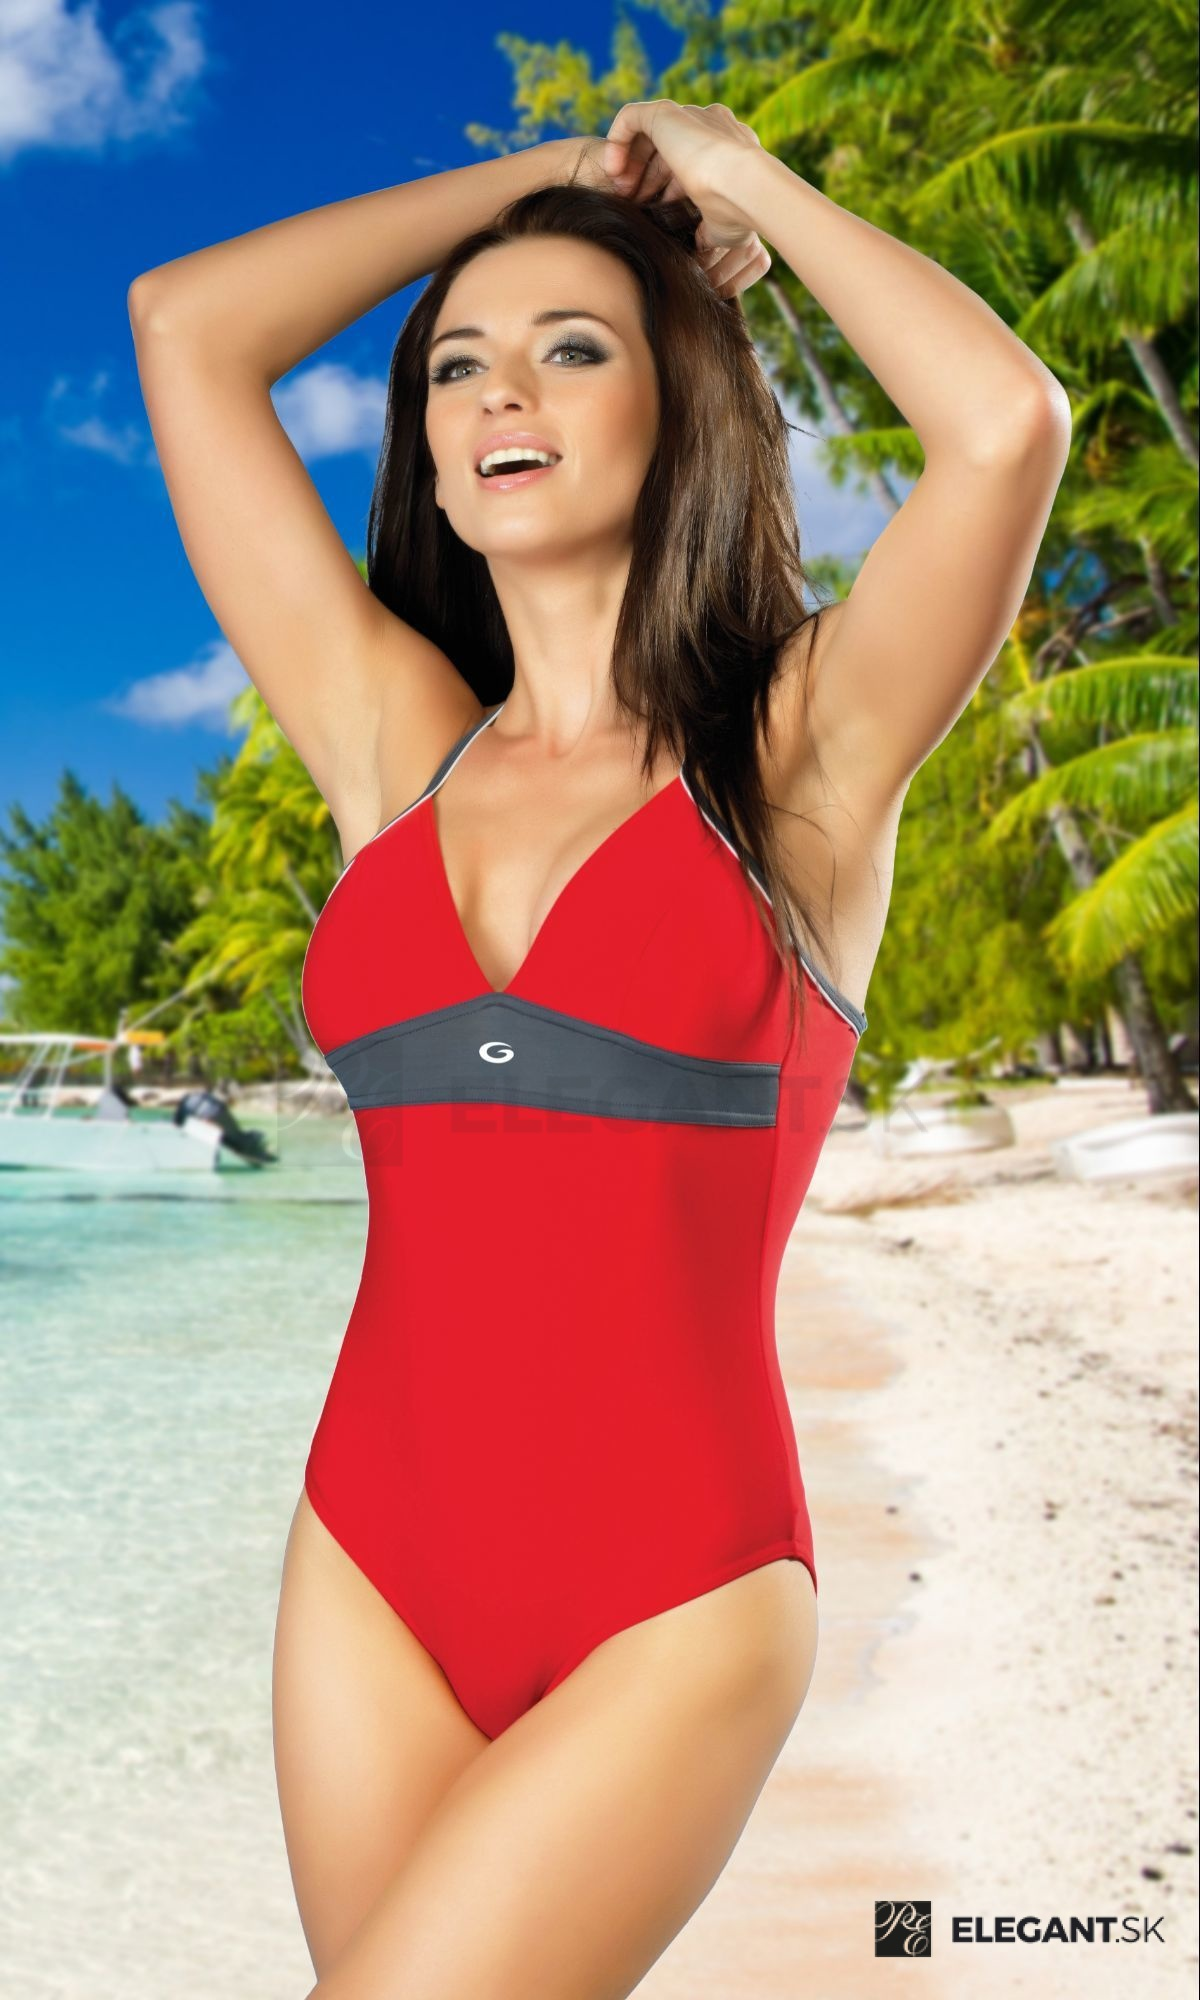 41176dd46 Jednodielne športové červené plavky Rosanna I - ELEGANT.sk